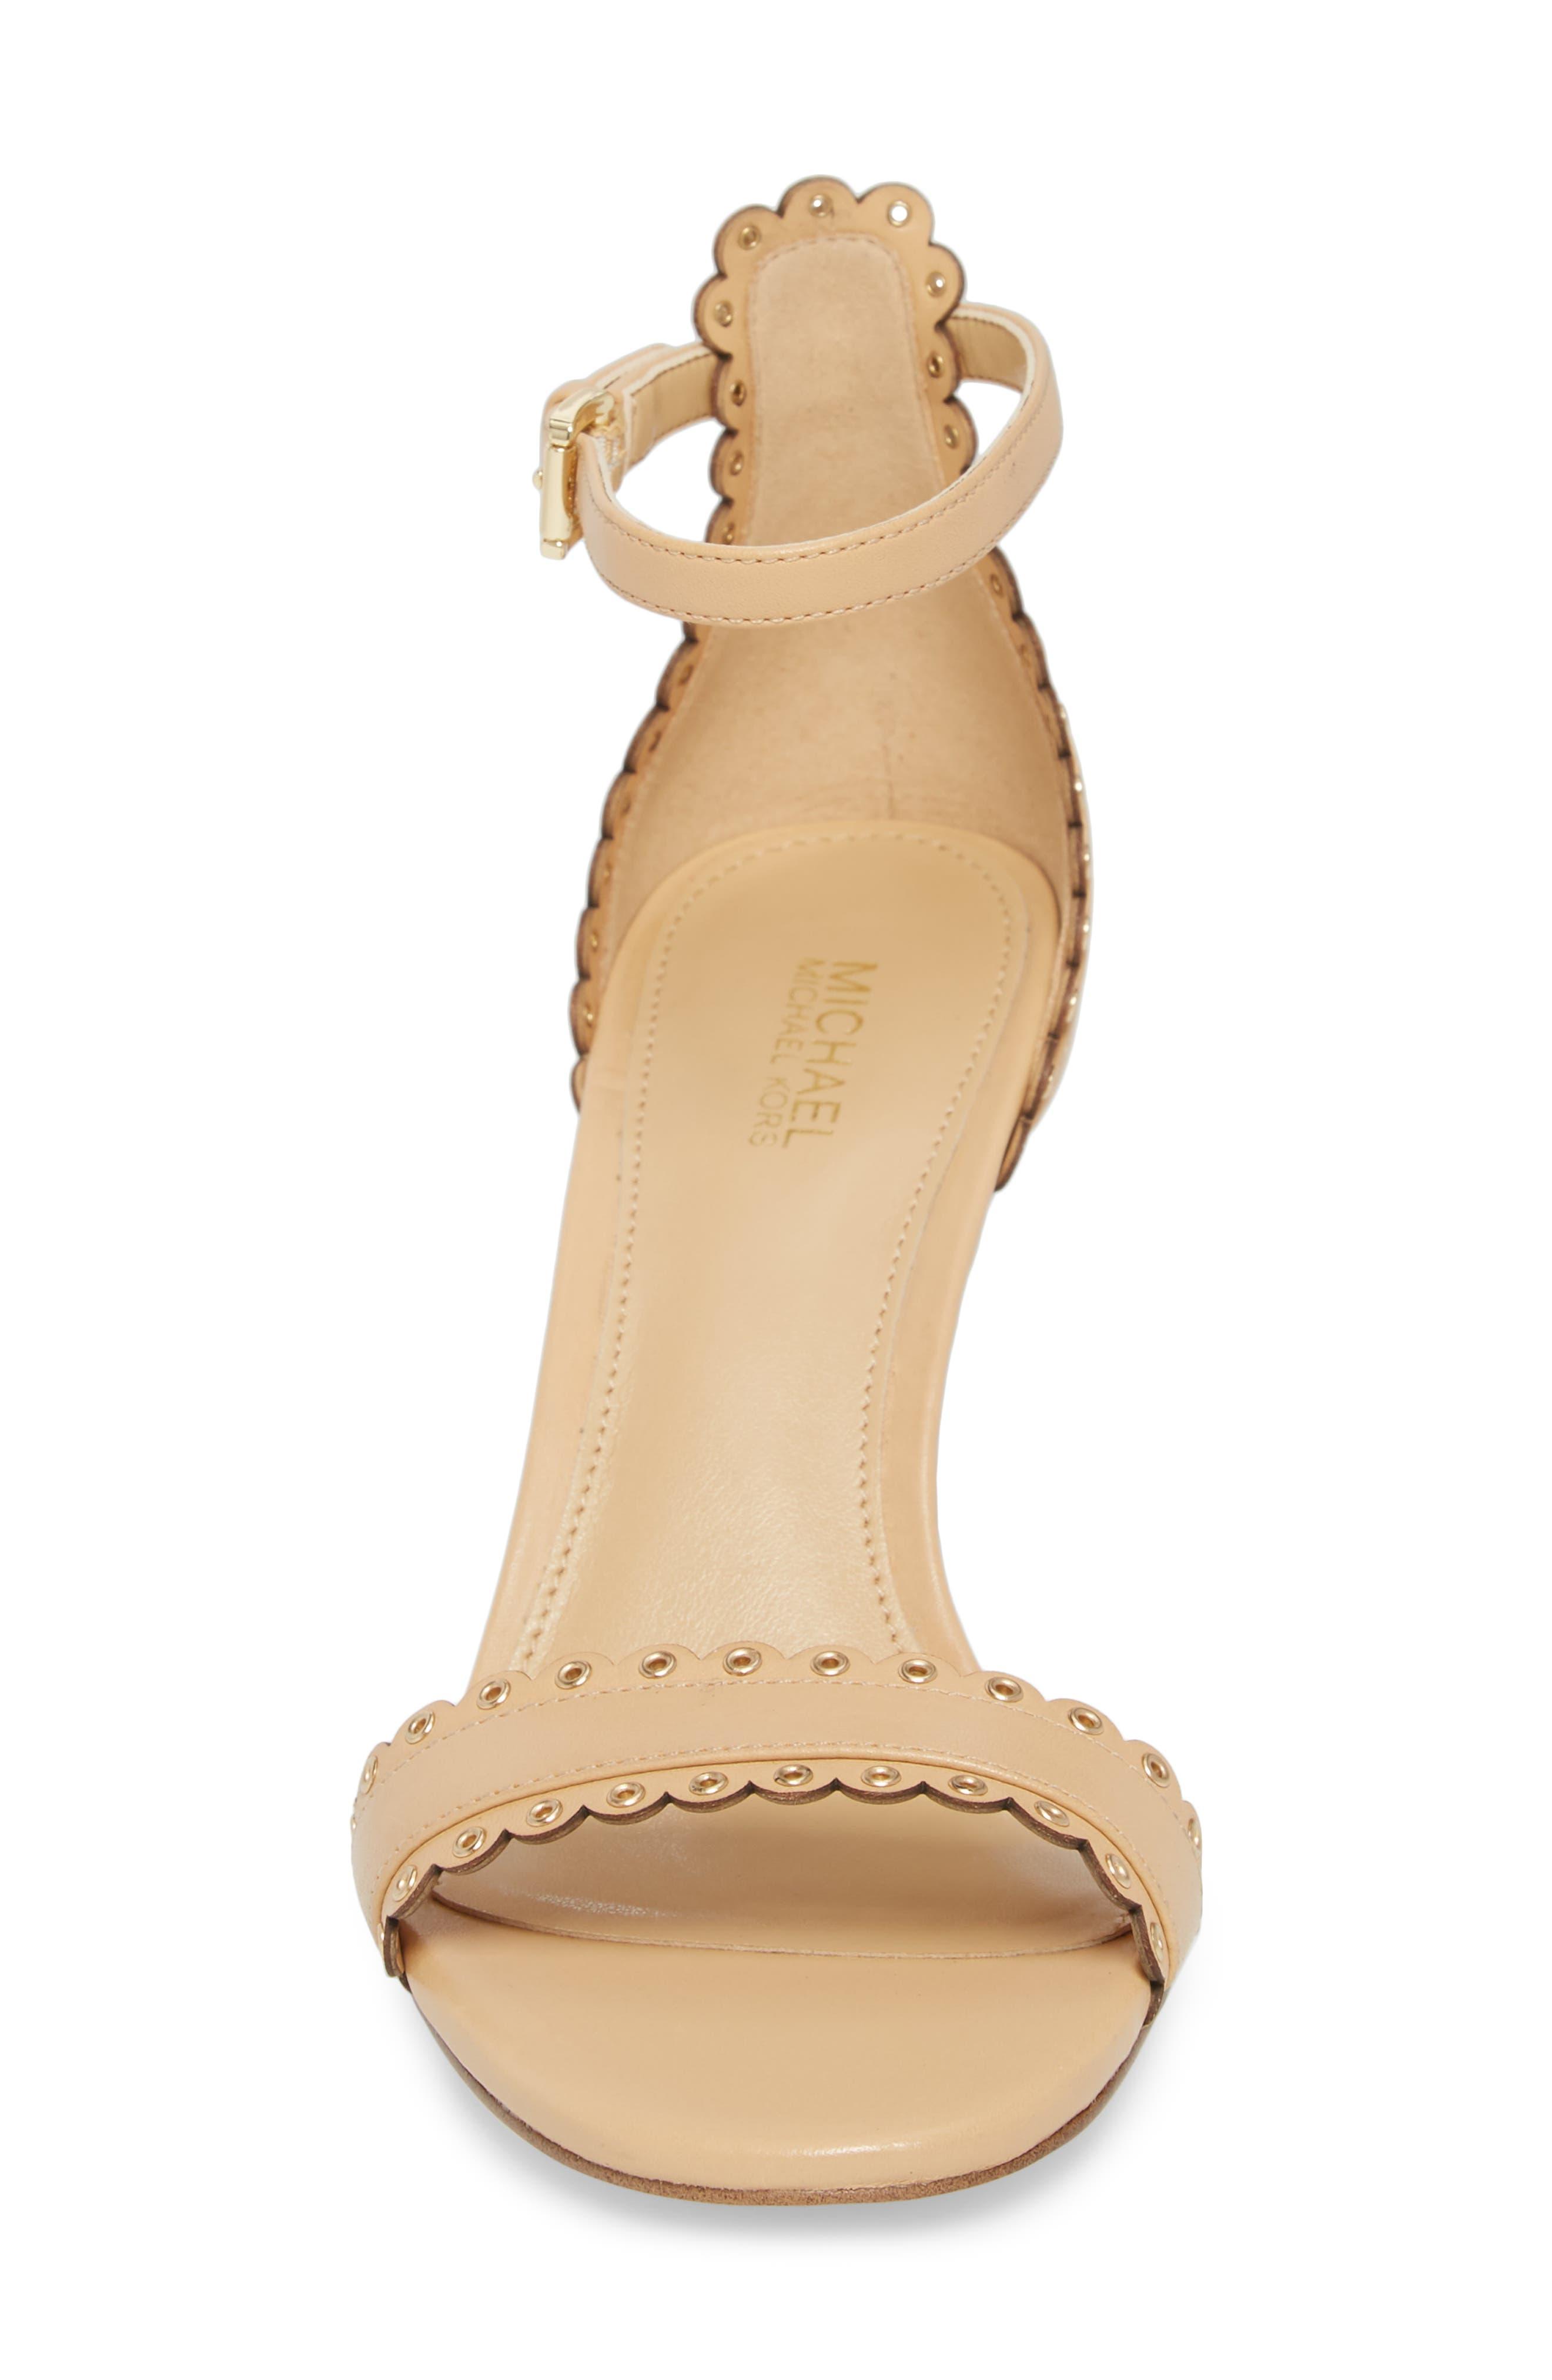 Jessie Sandal,                             Alternate thumbnail 4, color,                             Butternut Leather